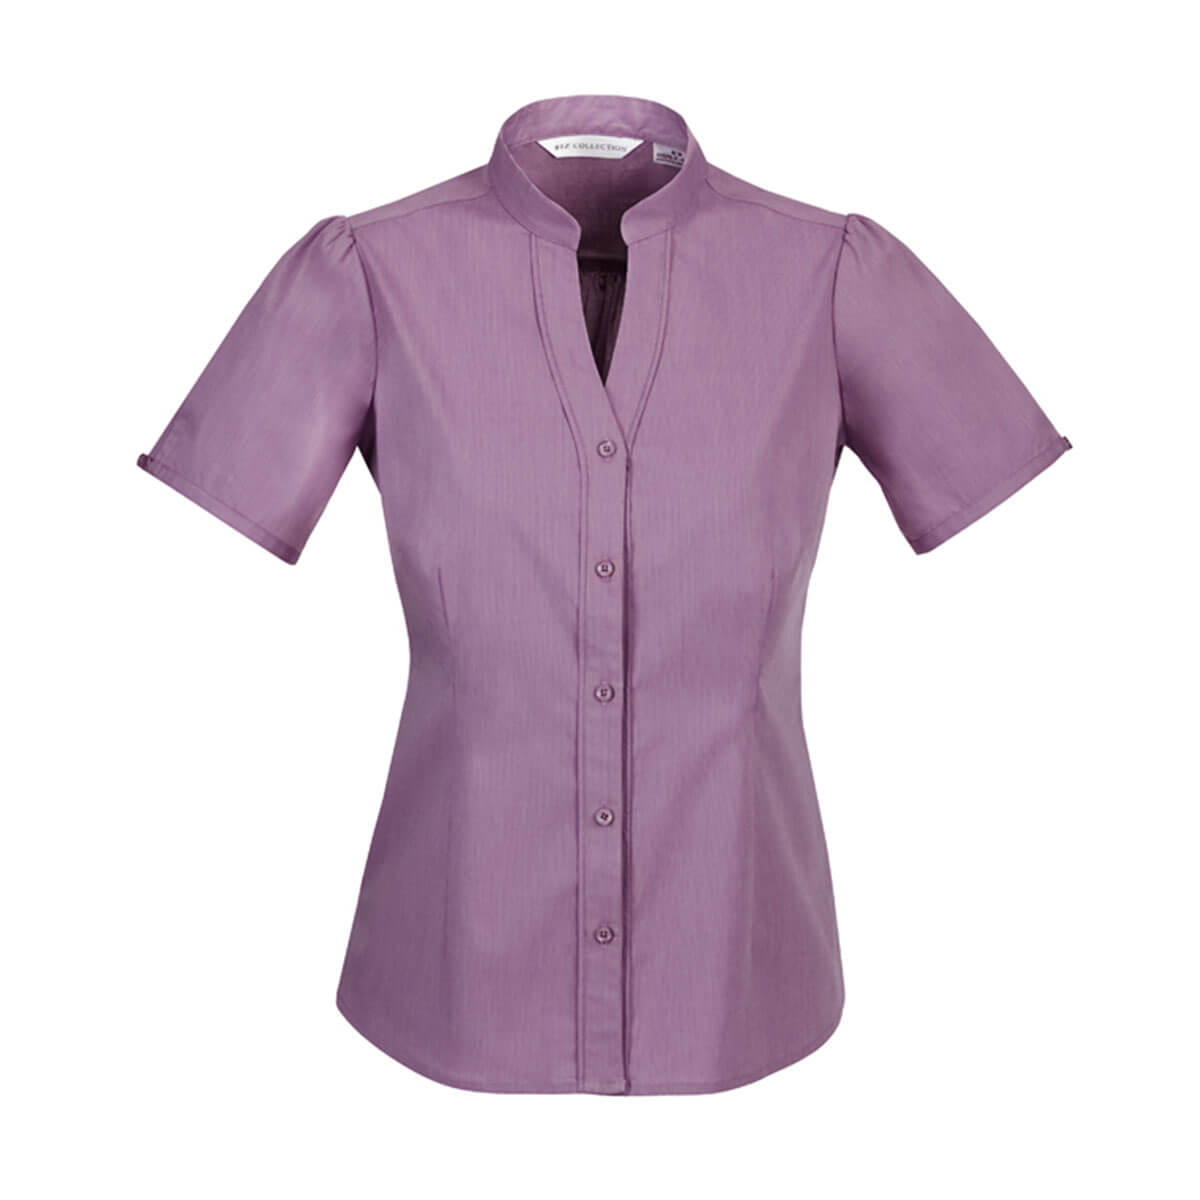 Ladies Chevron Stand Collar Shirt-Grape